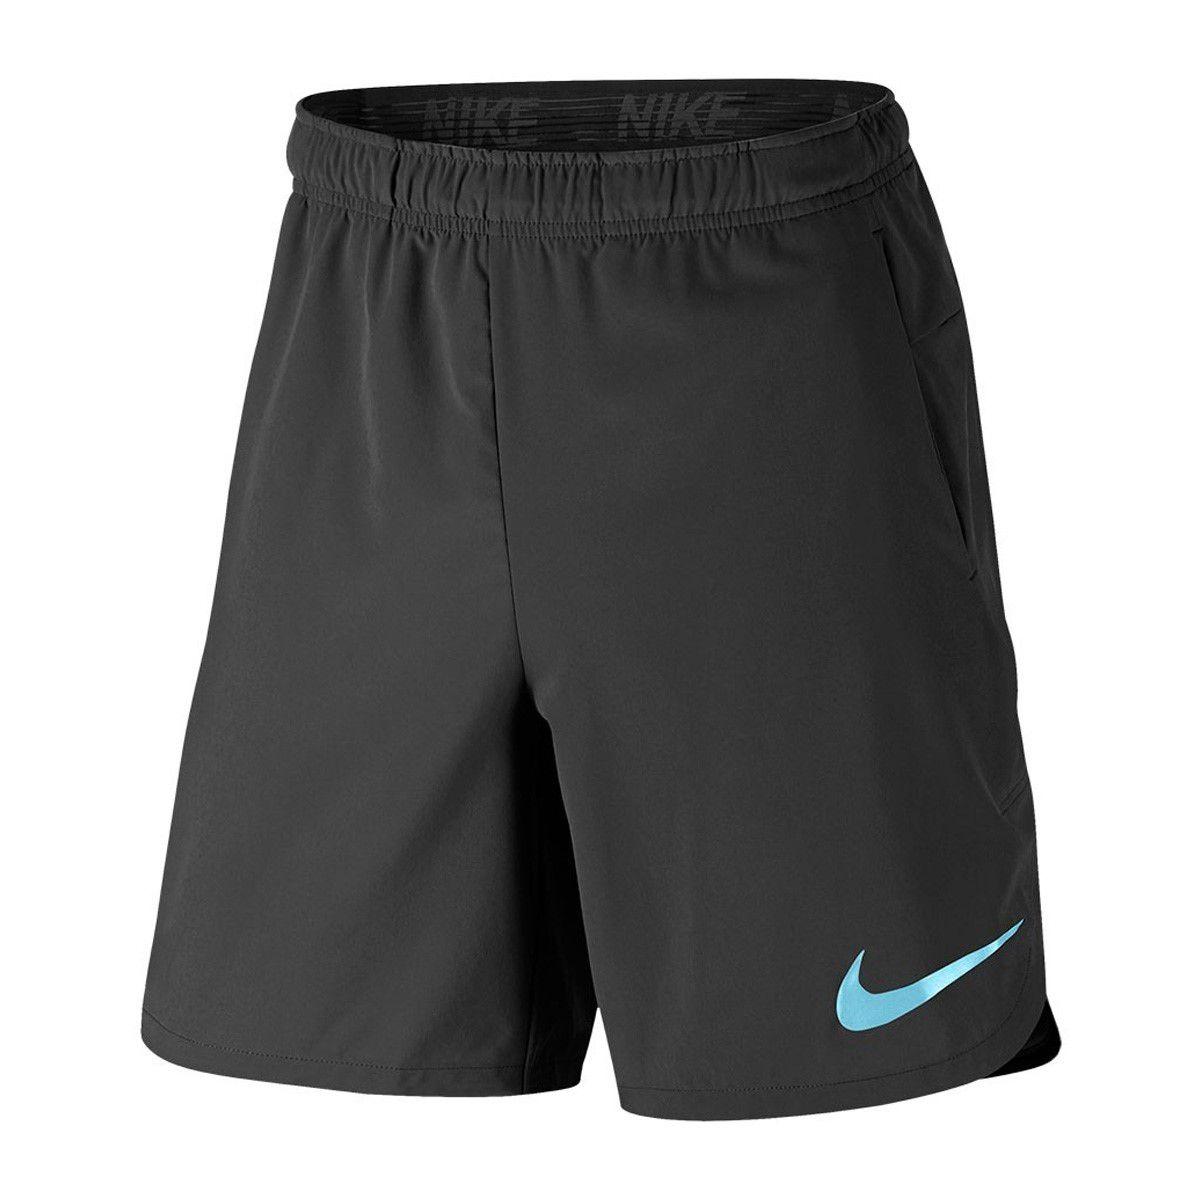 Nike Vent Max Şort 833374038